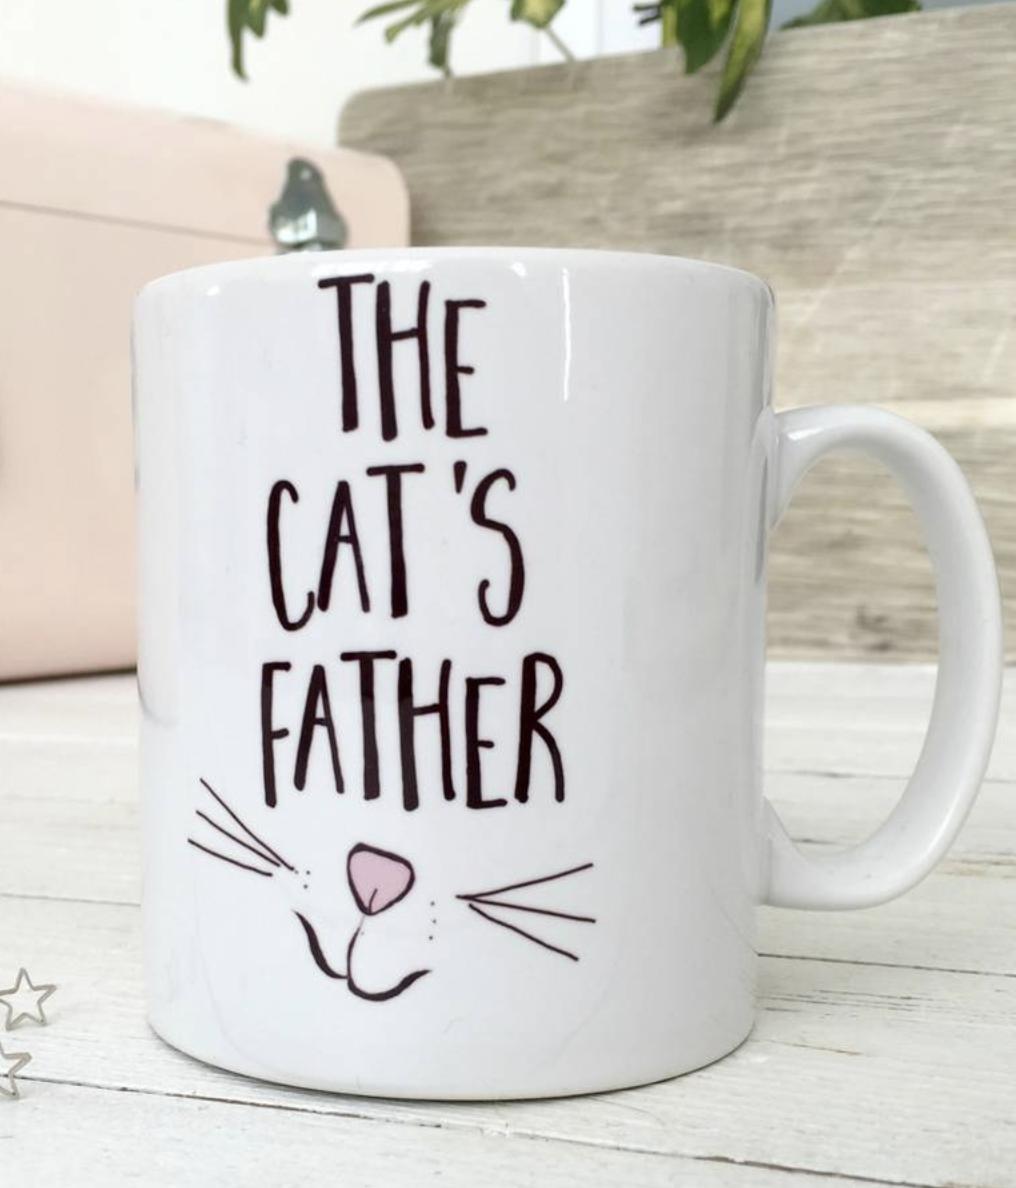 Crazy Cat Man! Cat's Father Gift This cat mug makes a